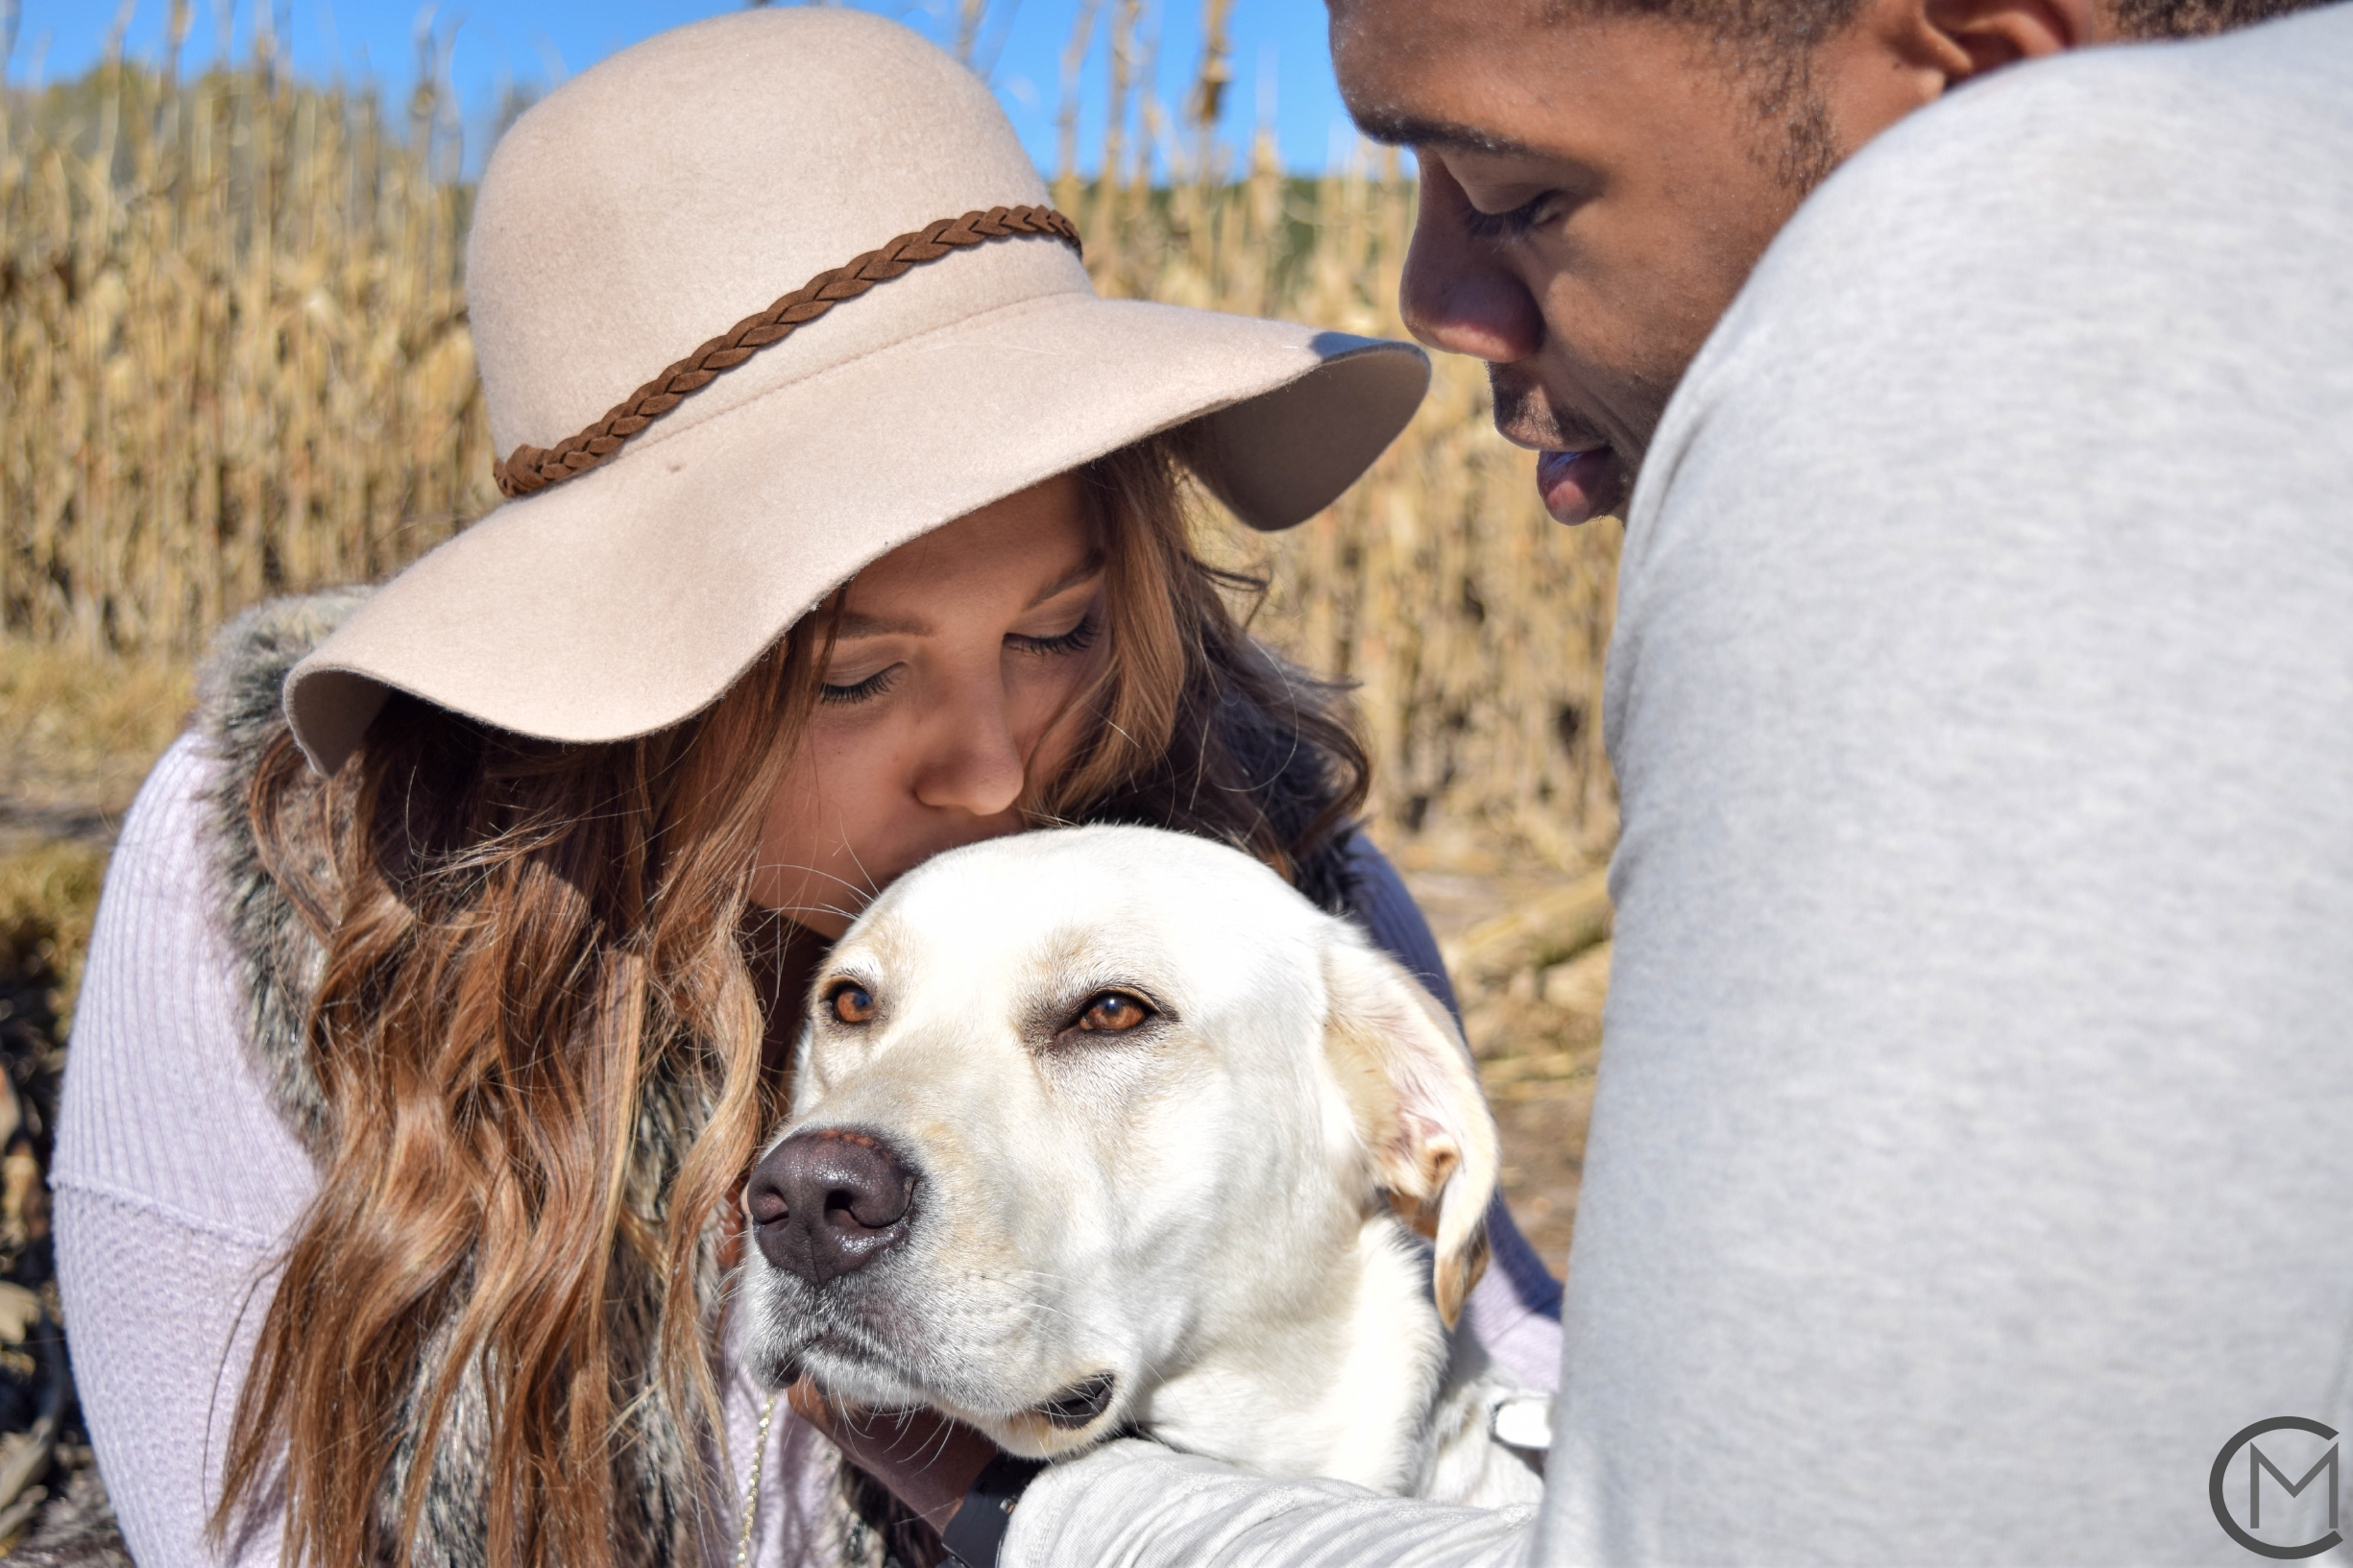 Sydney + Braxton (+ Hazel Pup) | Fall 2017 | Britt's Farm | Couples Session